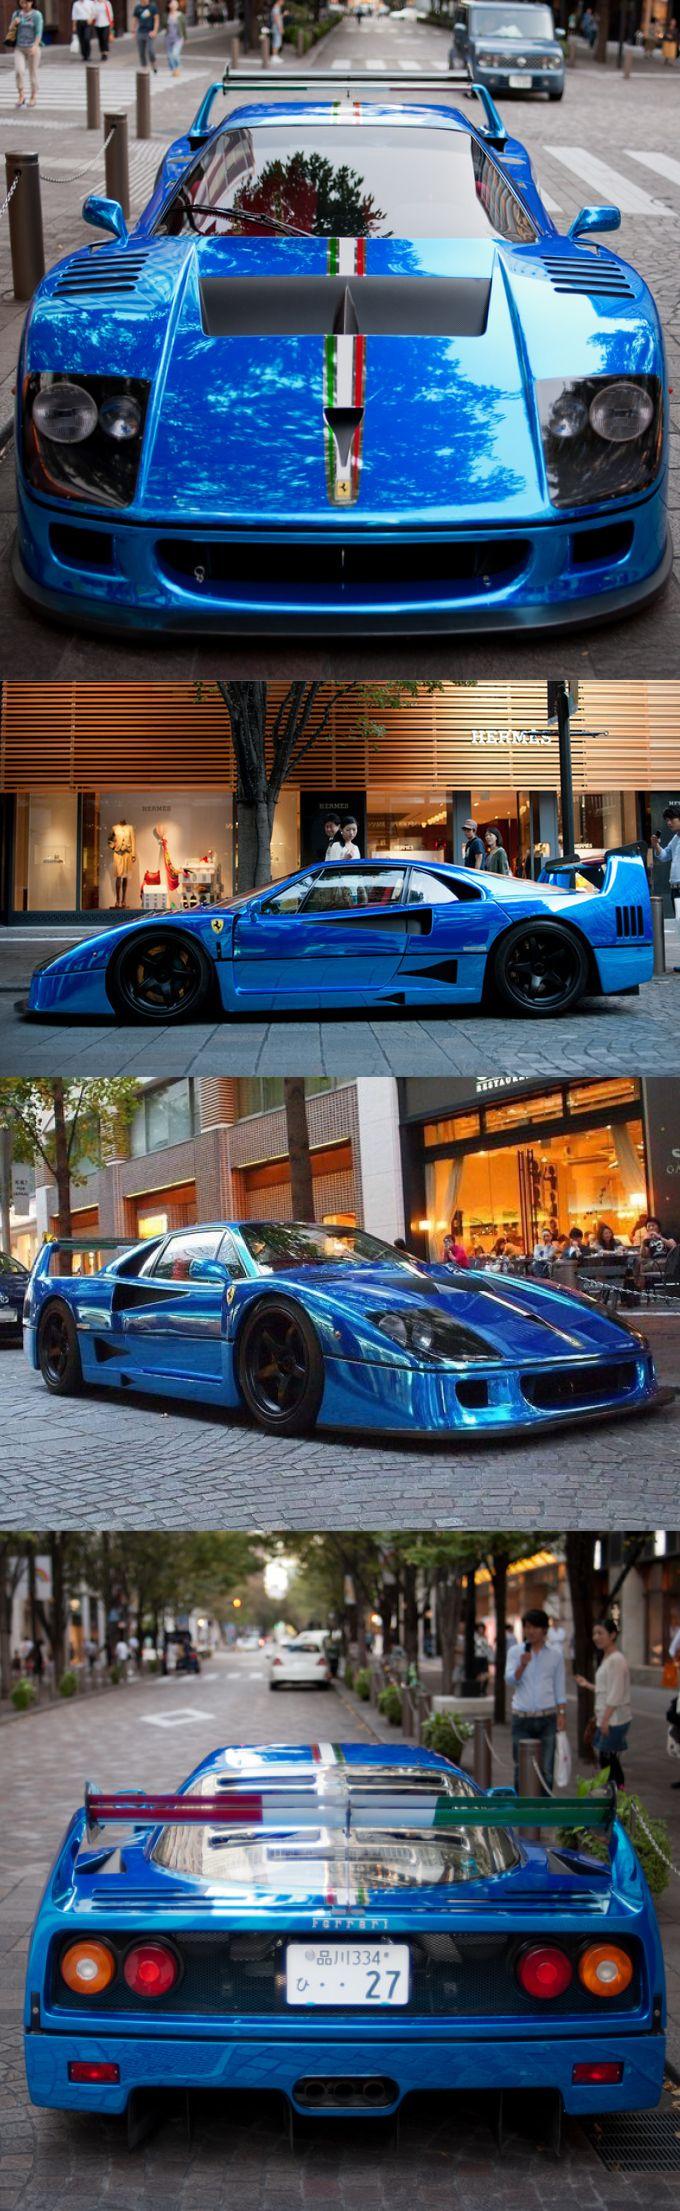 1989 Ferrari F40 LM / 760hp / Italy / blue chrome wrap